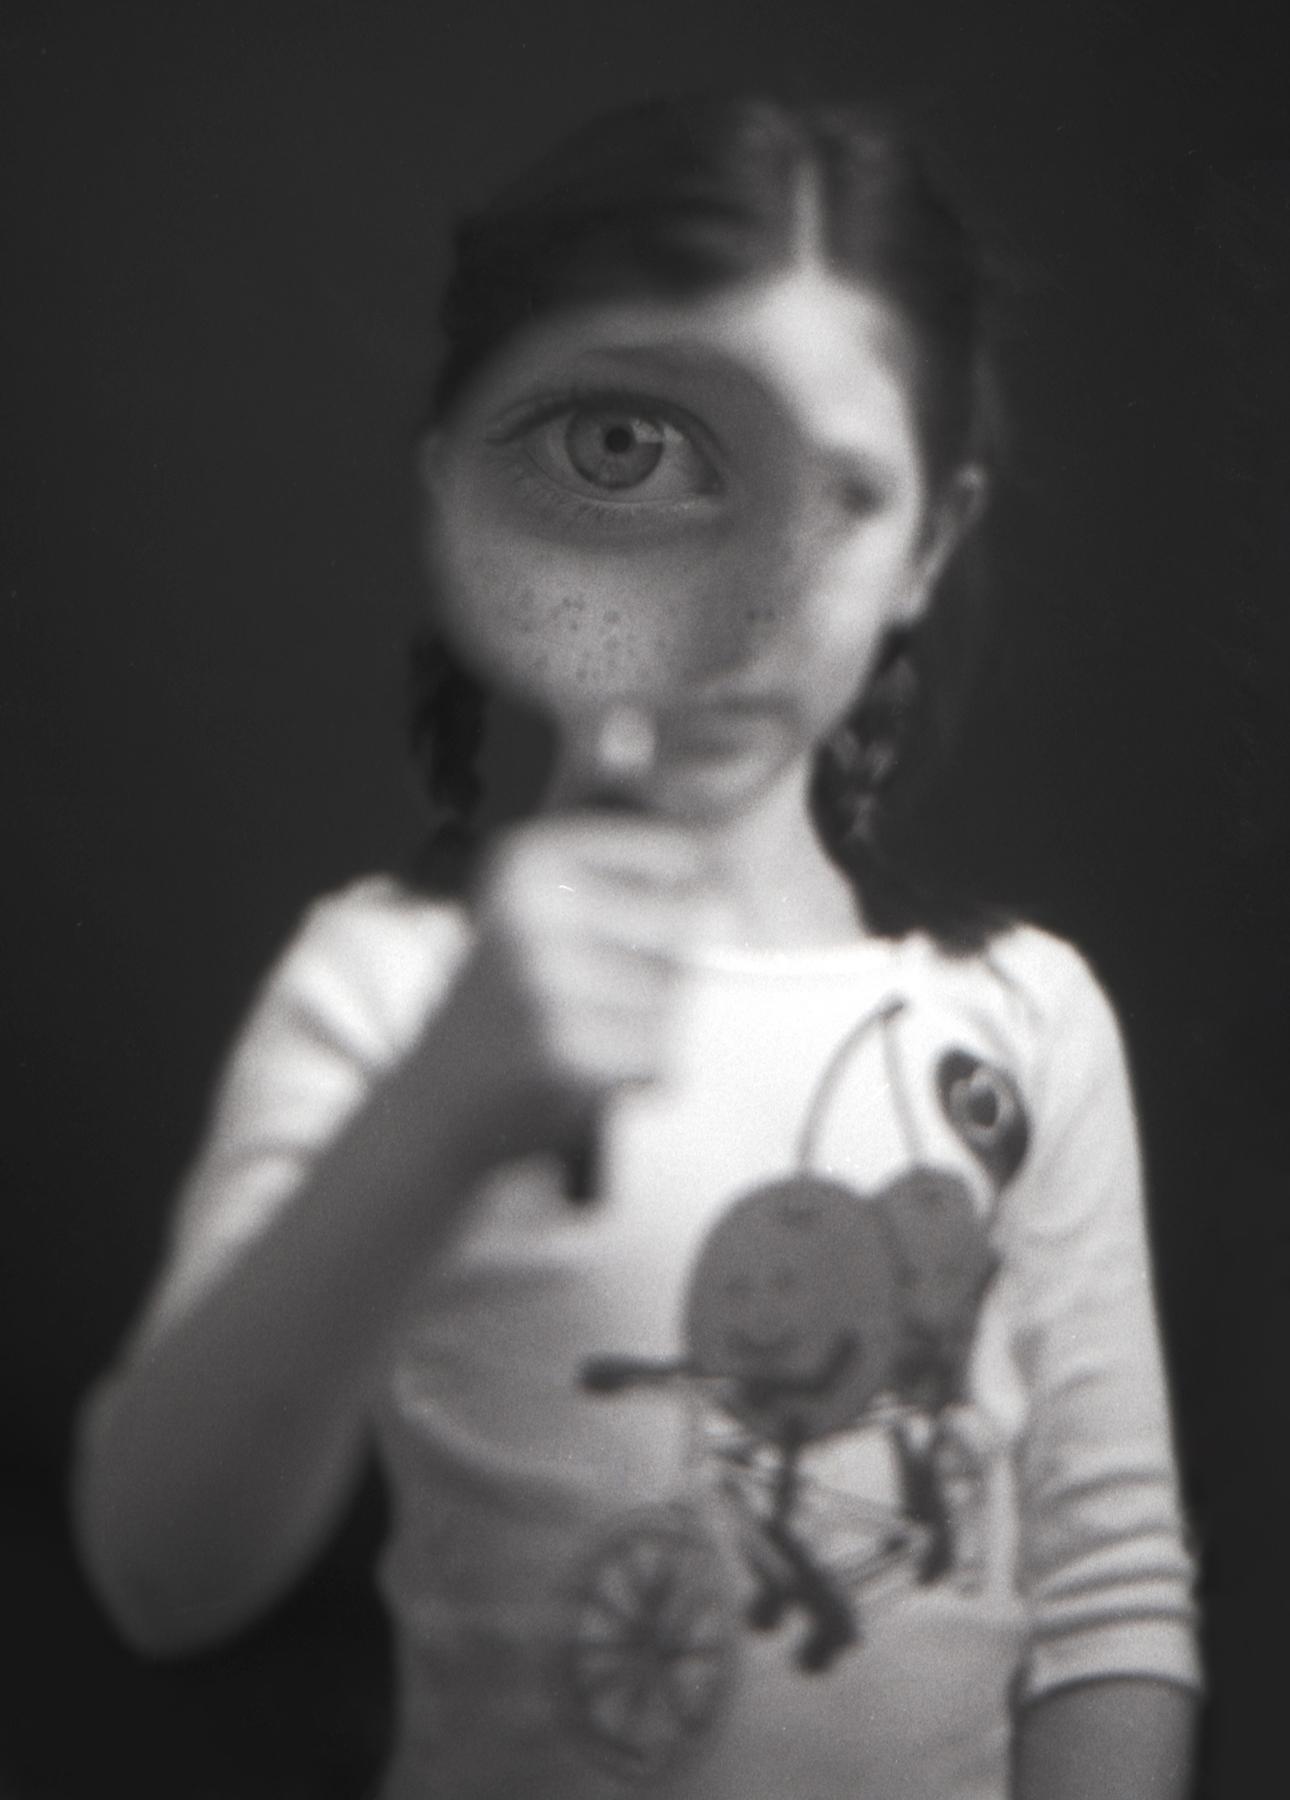 Magna Eye | Minolta SRT 102 | Kodak TMax 100 | Ellen Goodman